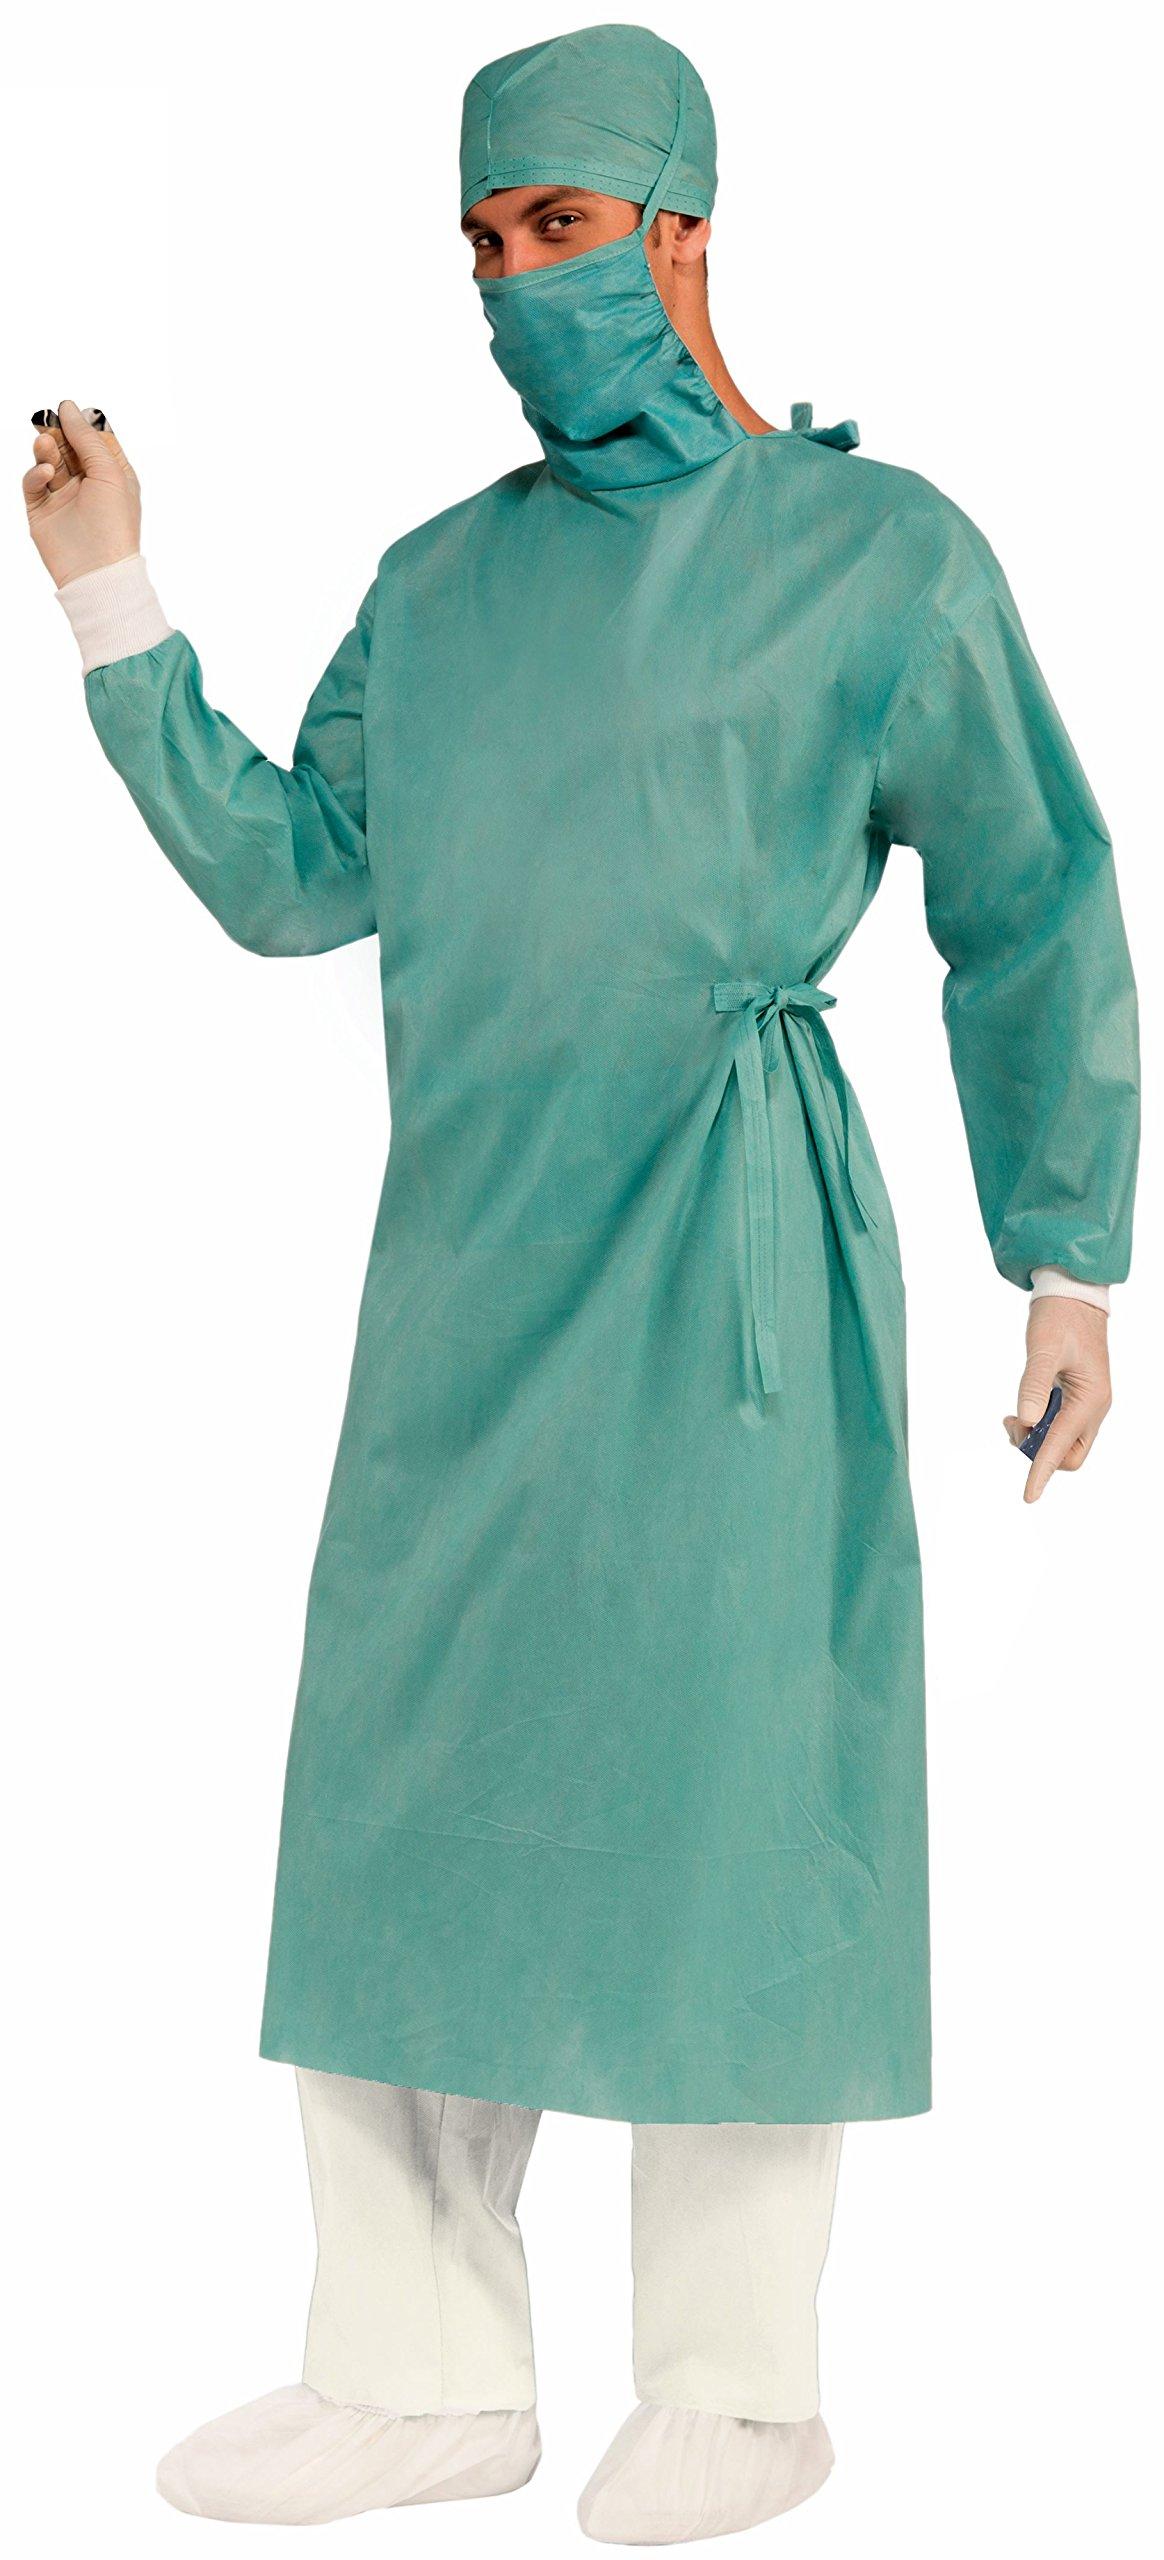 Amazon.com: Forum Novelties Men\'s Master Surgeon Adult Costume ...